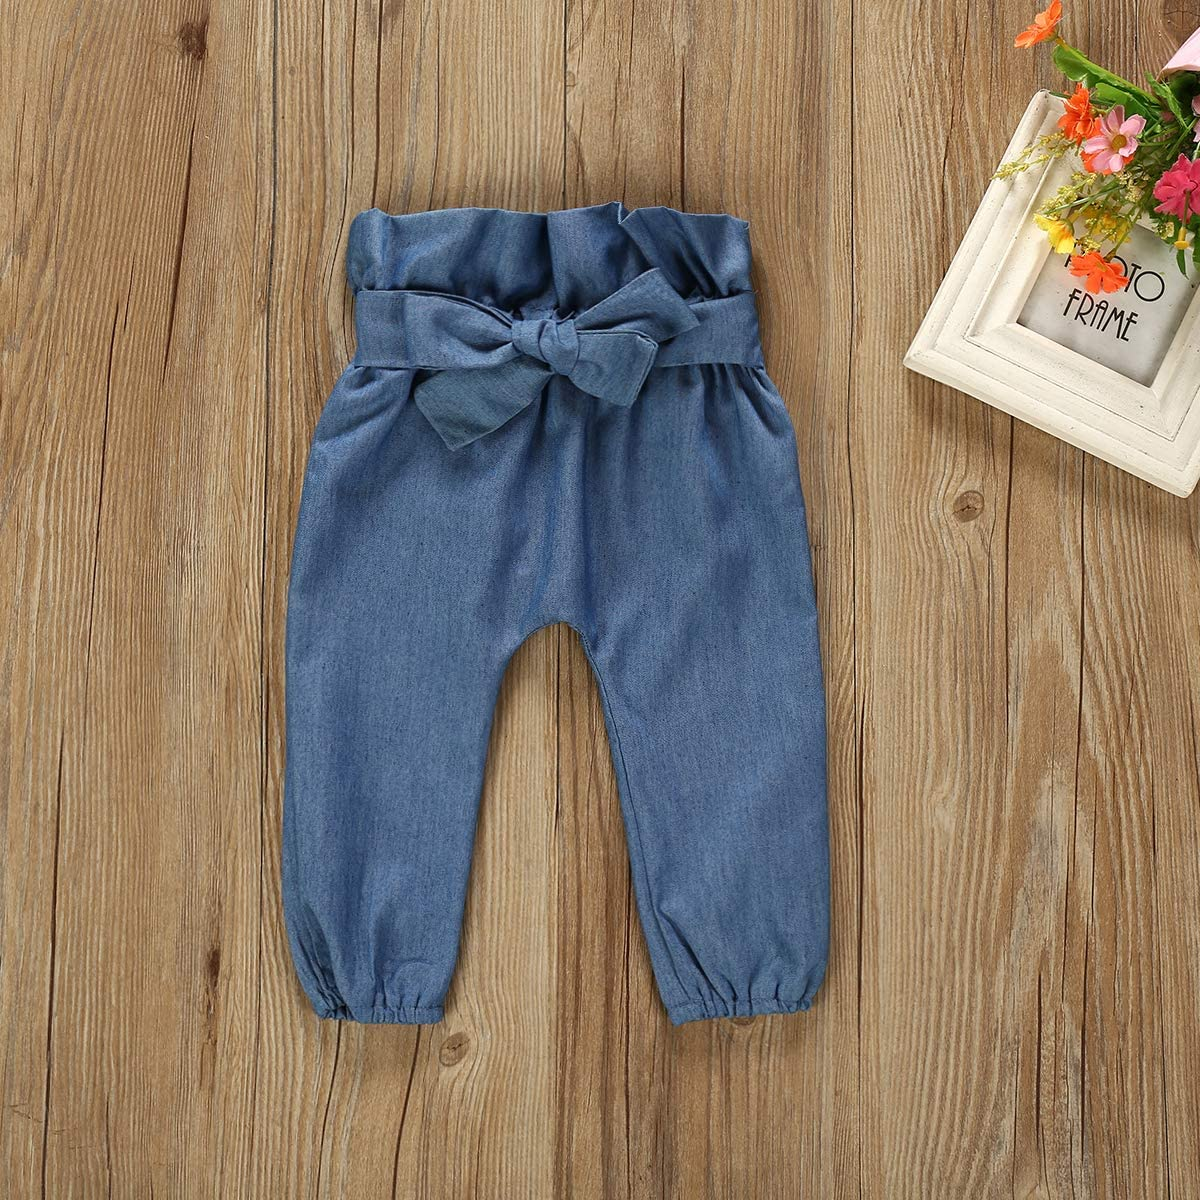 Pantalones para 0-24 Meses greatmtx 2 Piezas Toddler Baby Girls Clothes Outfits Mameluco de Manga Larga